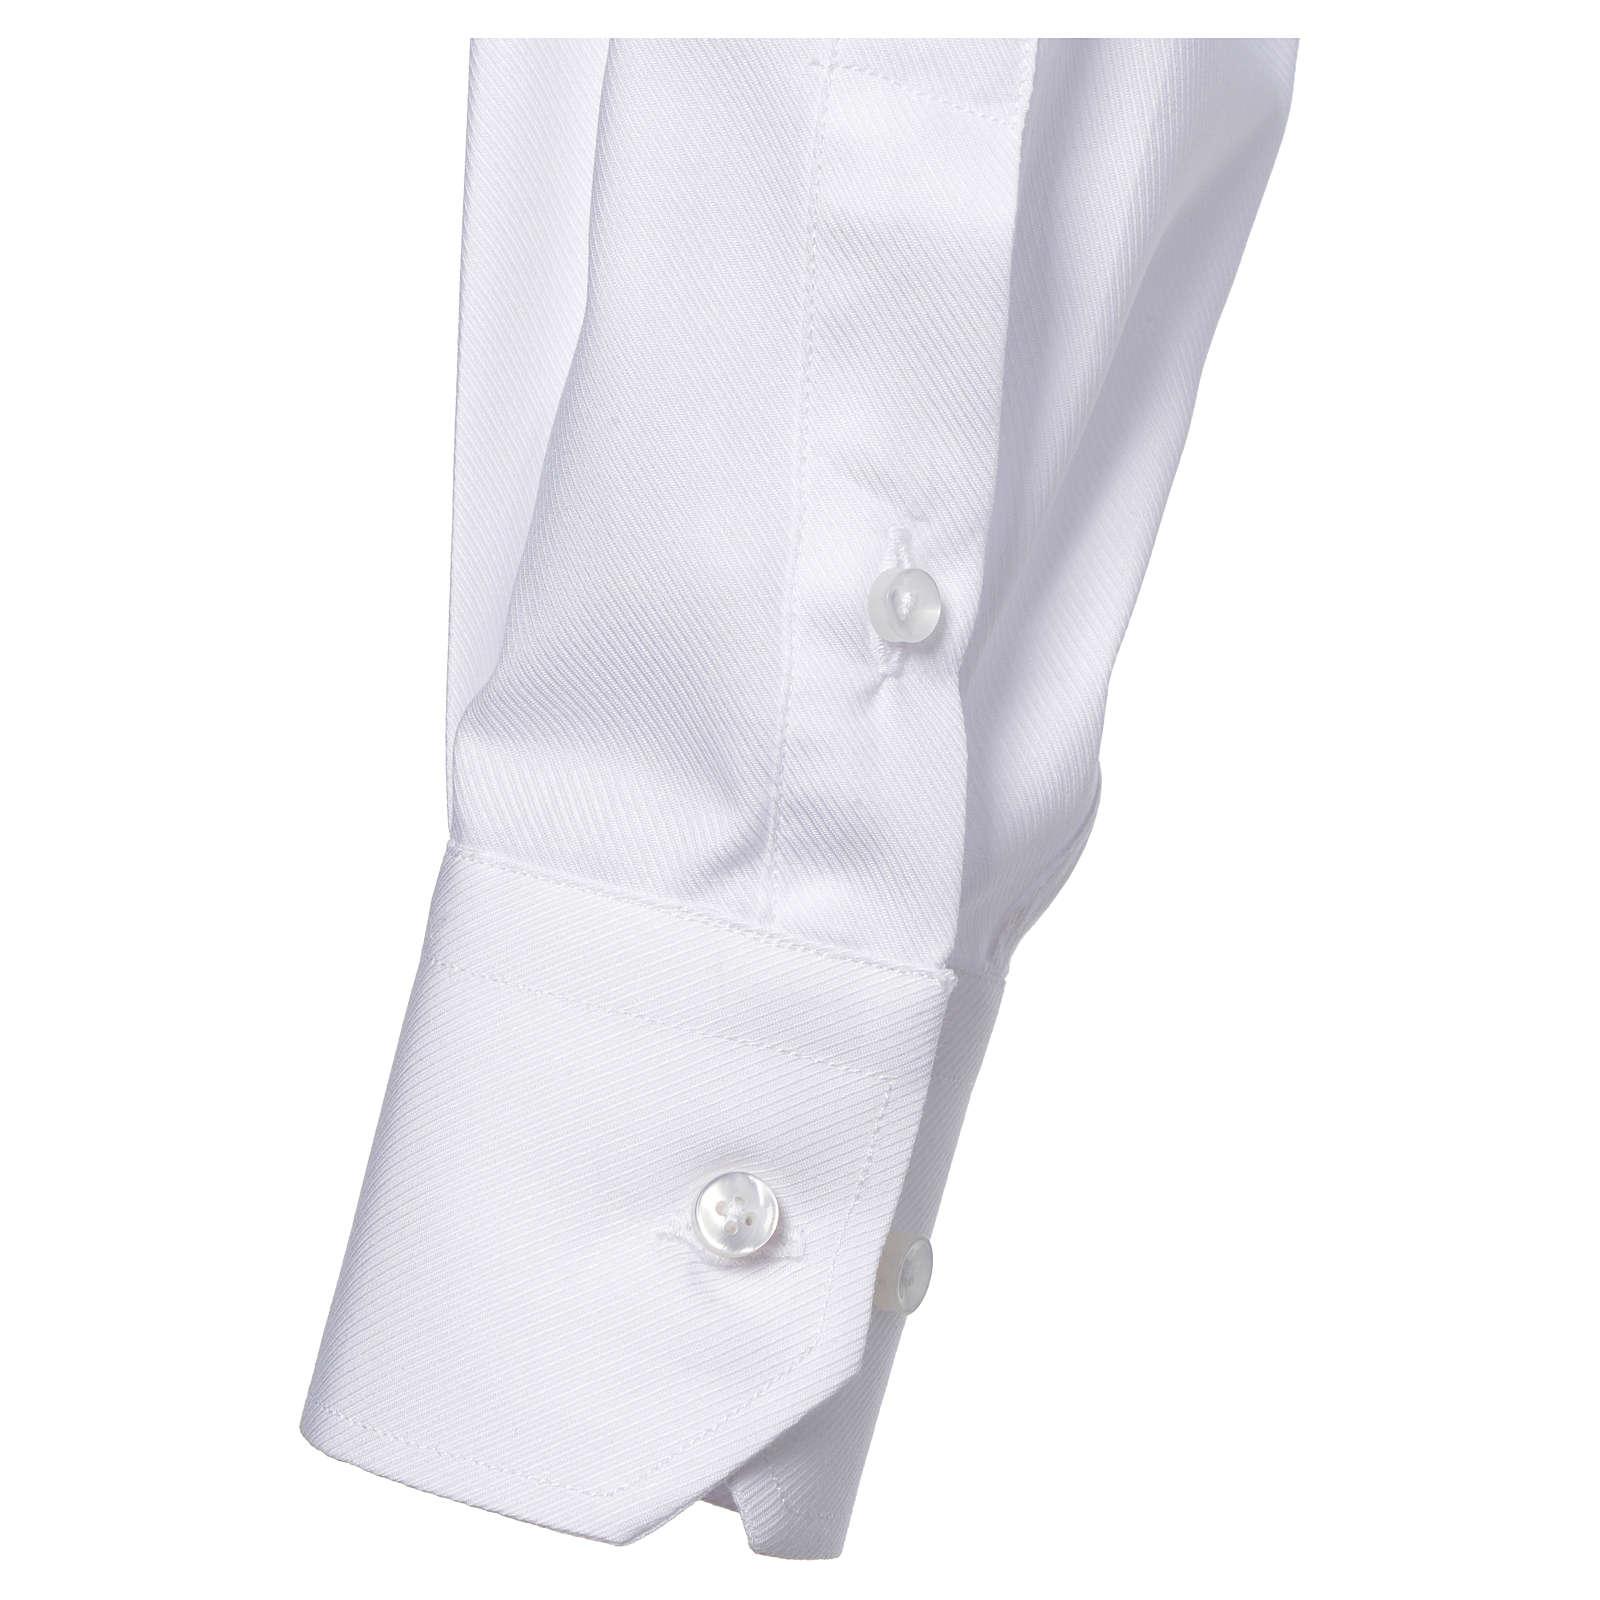 Camicia clergy M. Lunga Facile stiro Diagonale Misto cotone bianco 4